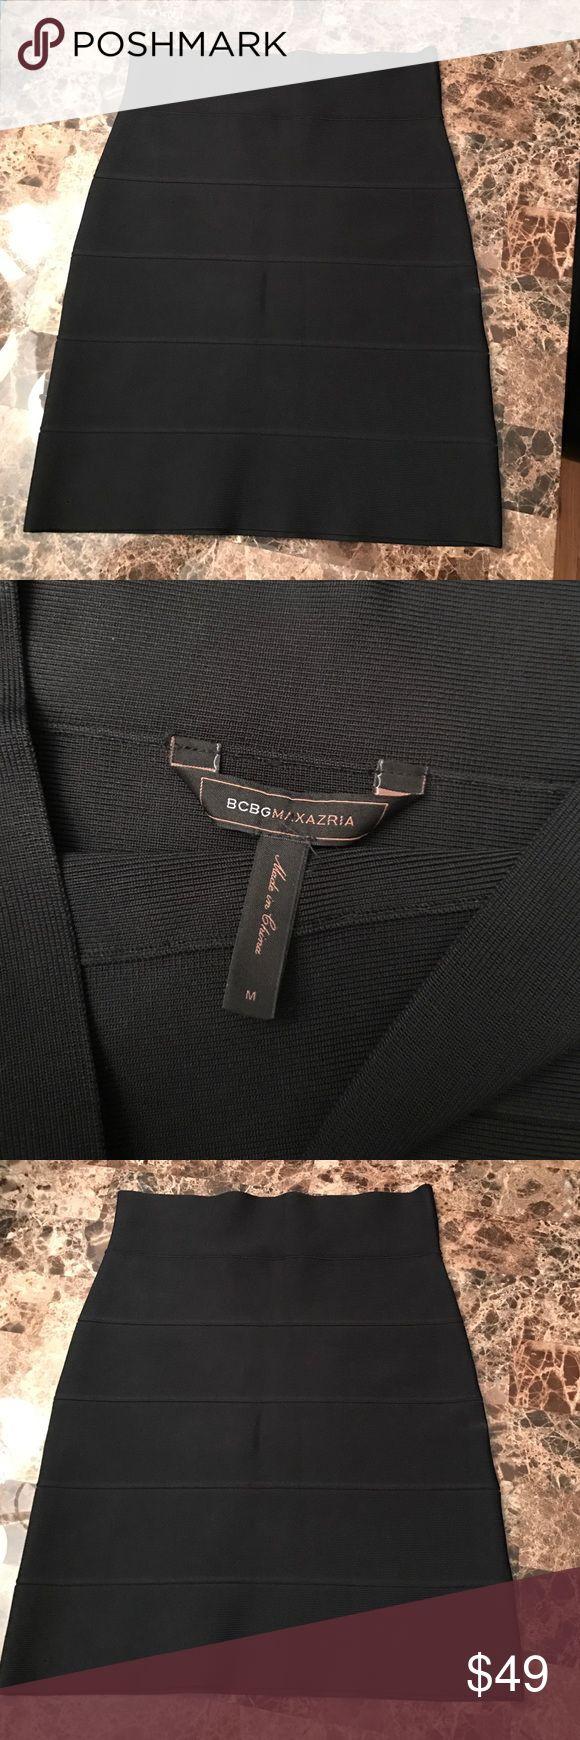 BCBG BANDAGE SKIRT NEW MEDIUM New. Tags removed. Black bandage skirt. 18.5 inches. BCBGMaxAzria Skirts Mini